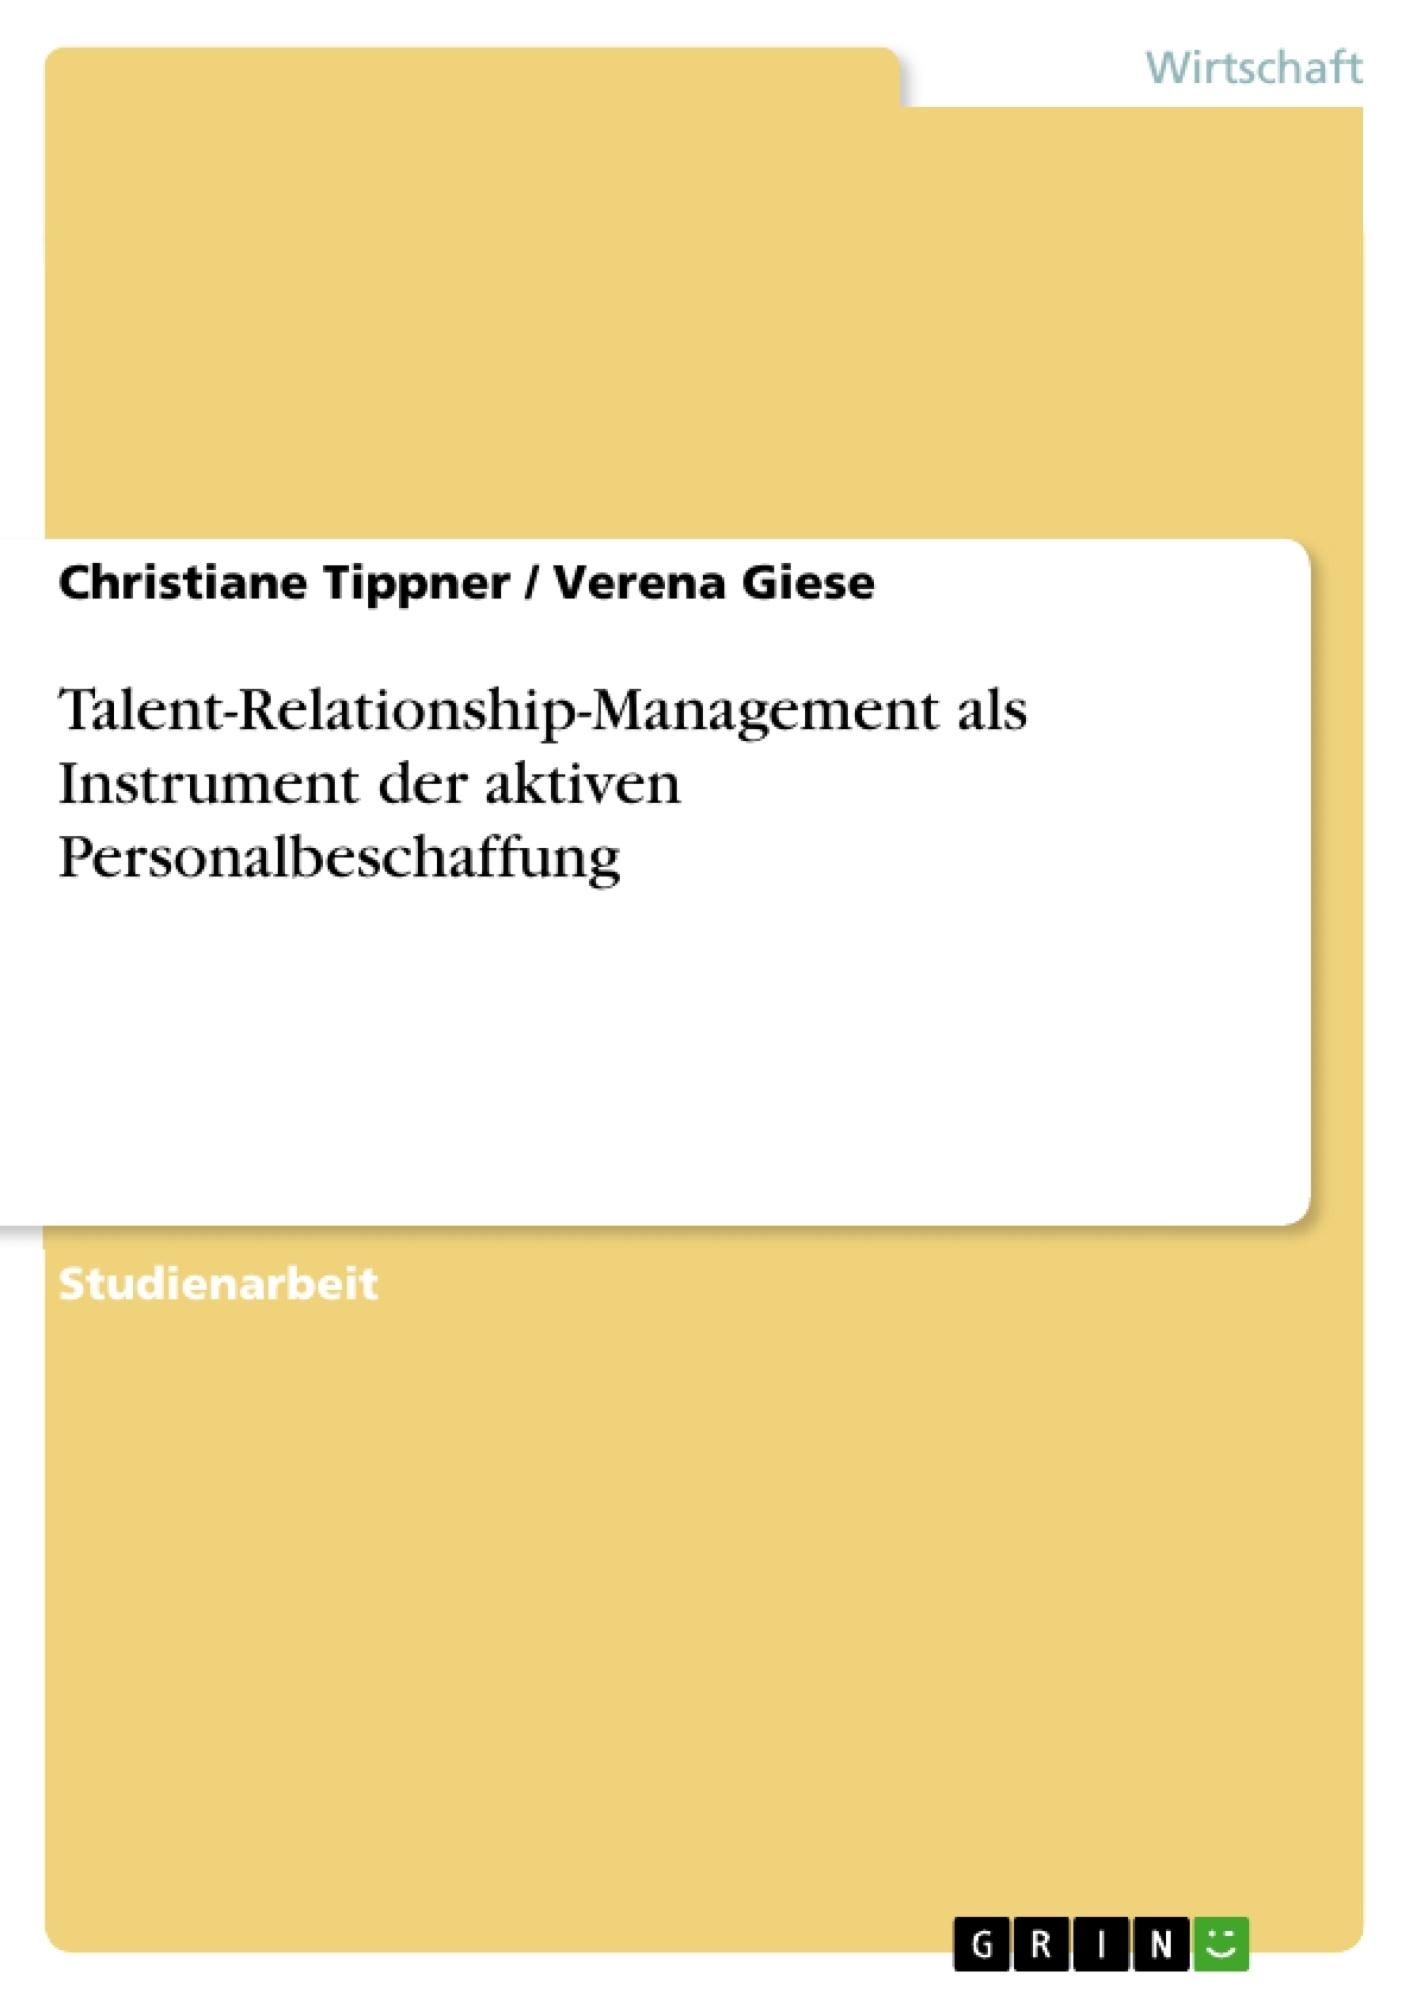 Titel: Talent-Relationship-Management  als Instrument der aktiven Personalbeschaffung